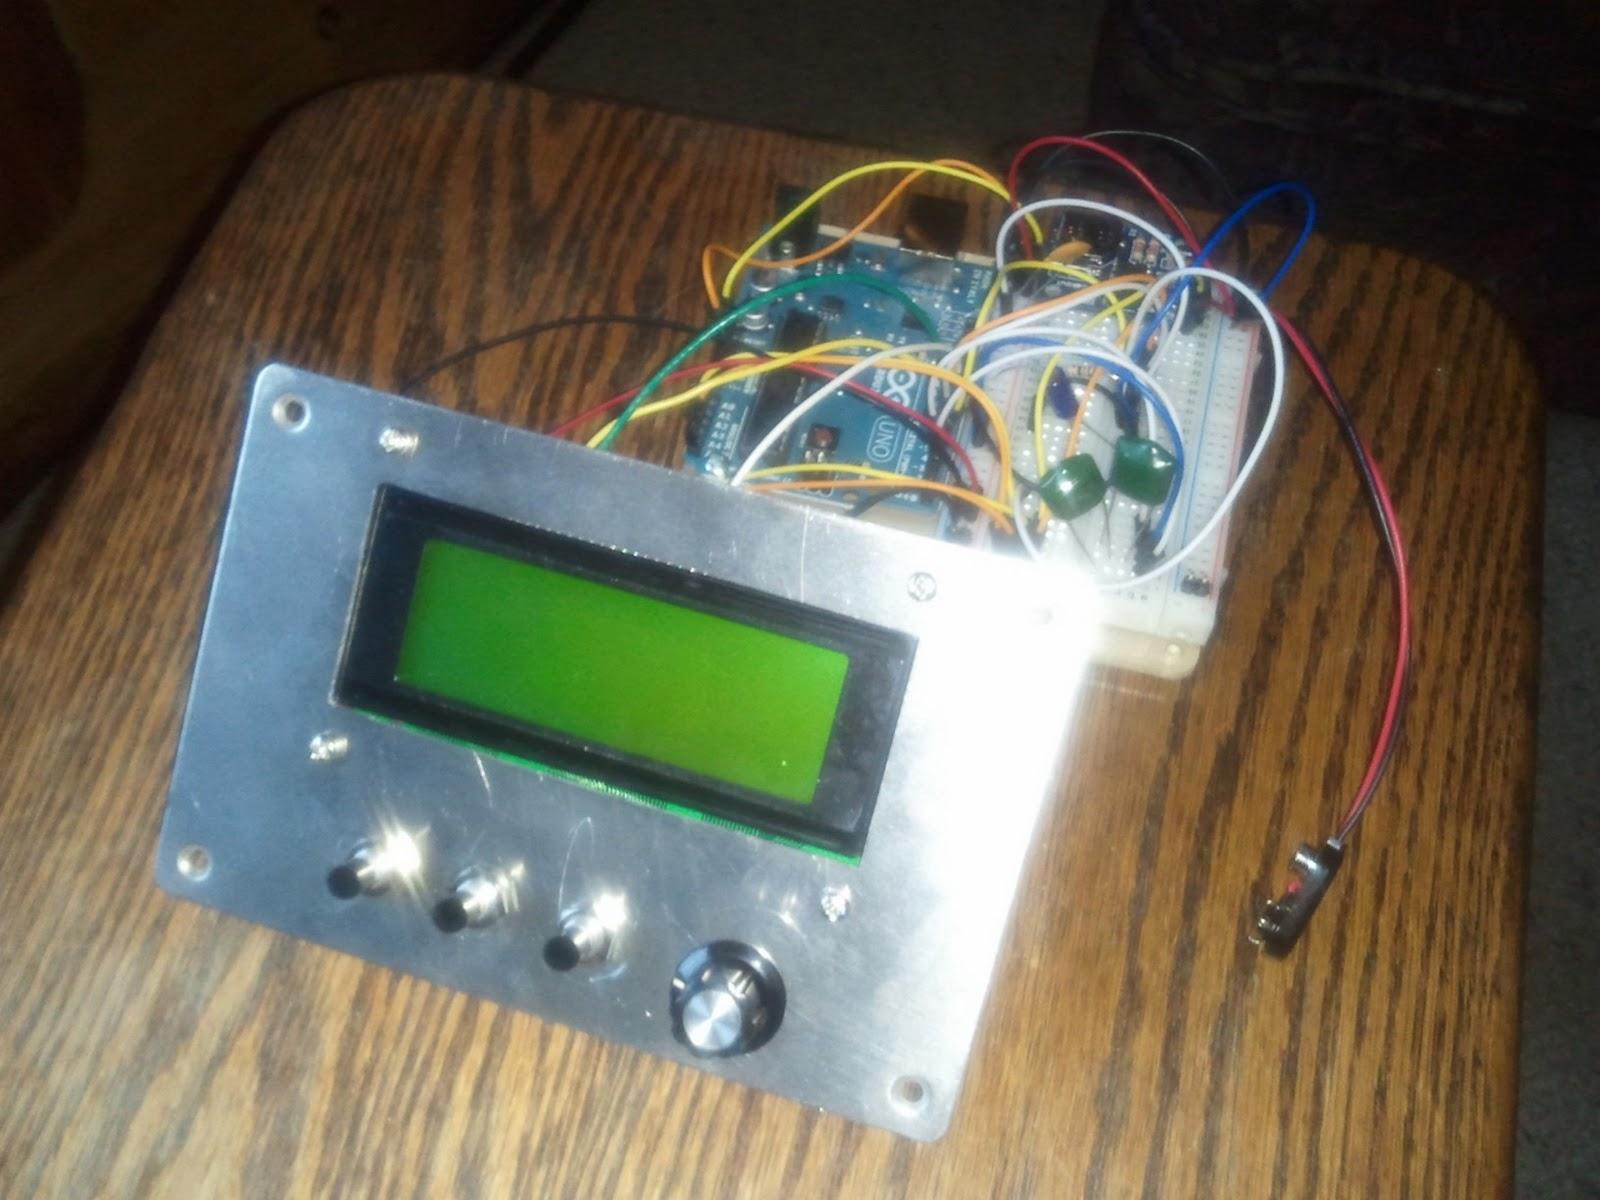 Ko m ham radio trying to spruce up the arduino